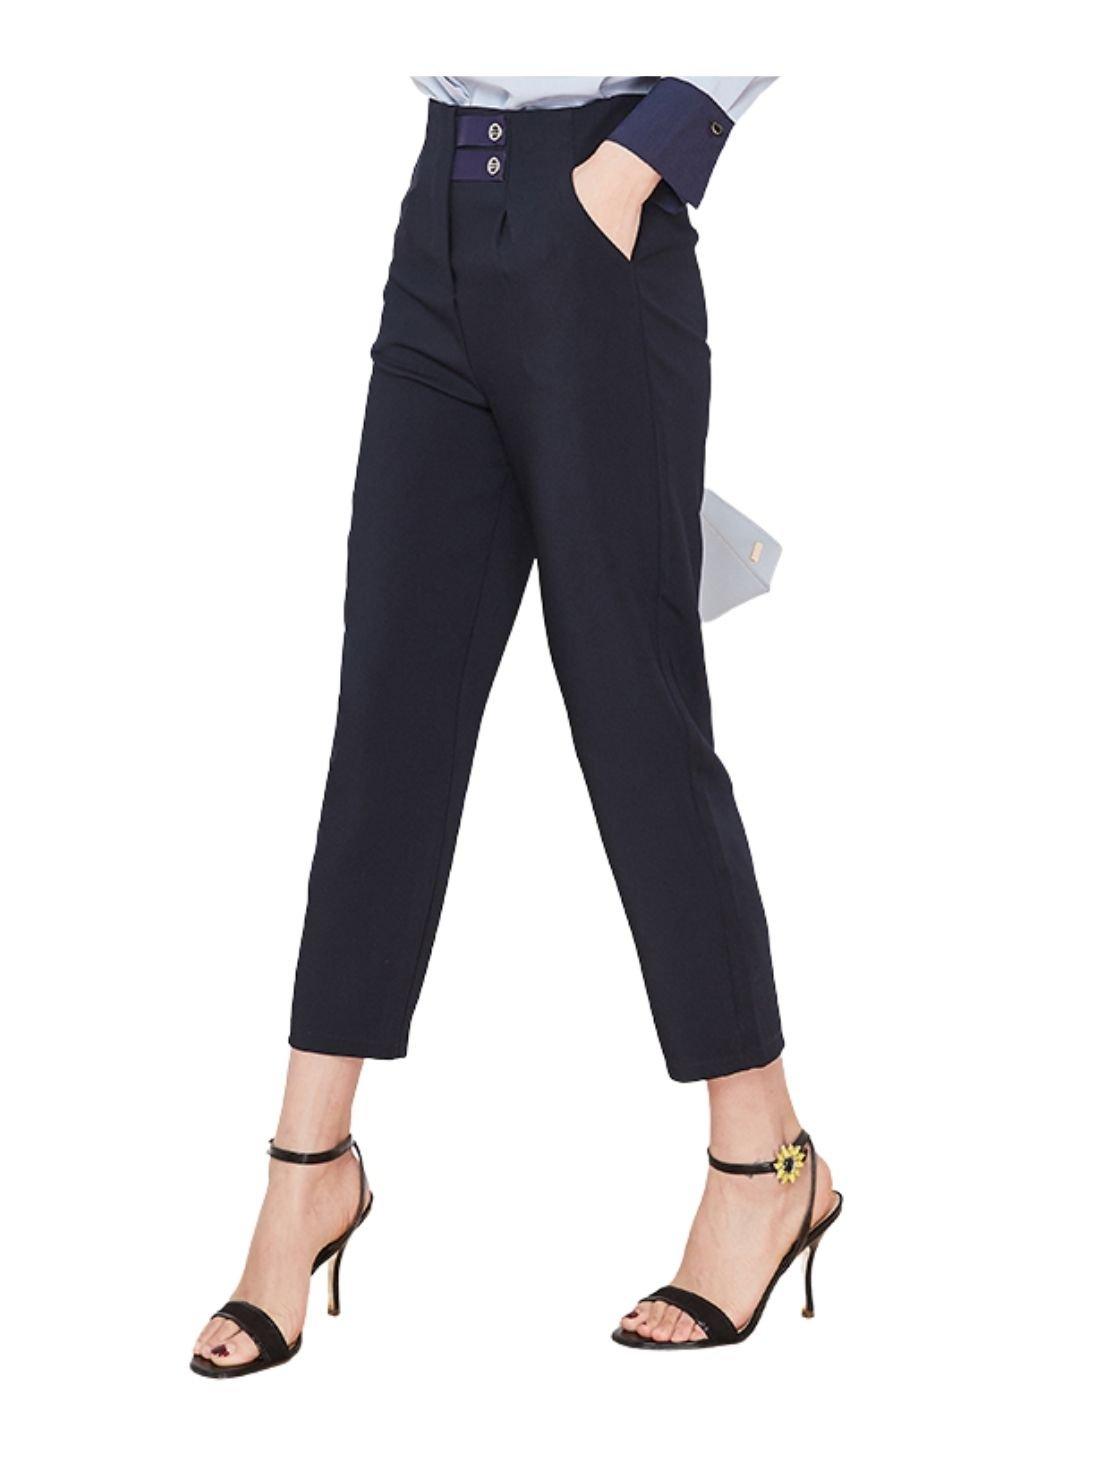 5xl Pencil Pants Trousers